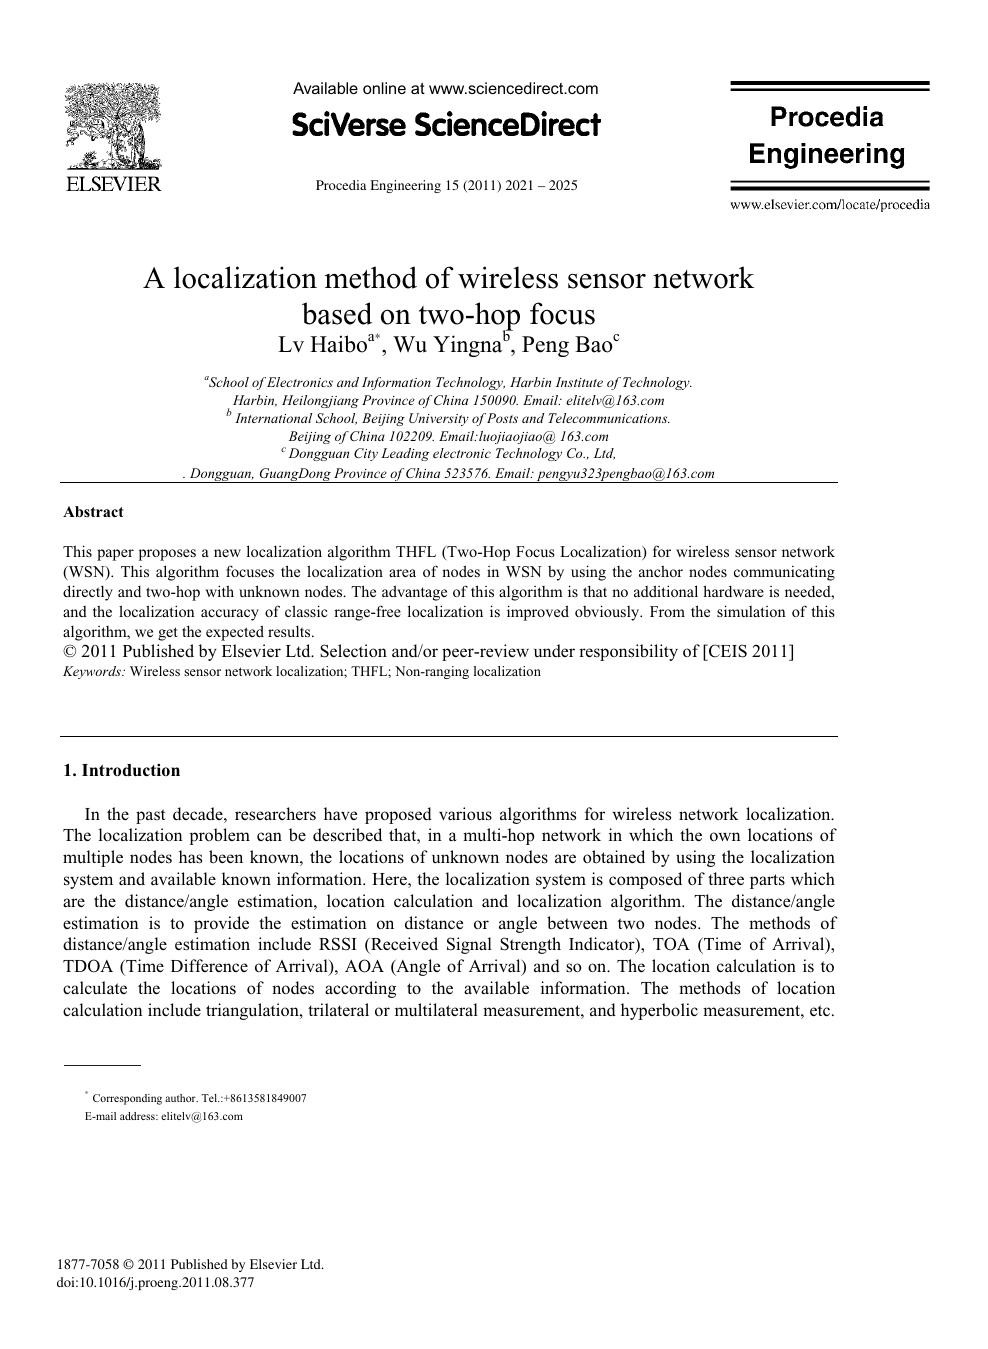 A localization method of wireless sensor network based on